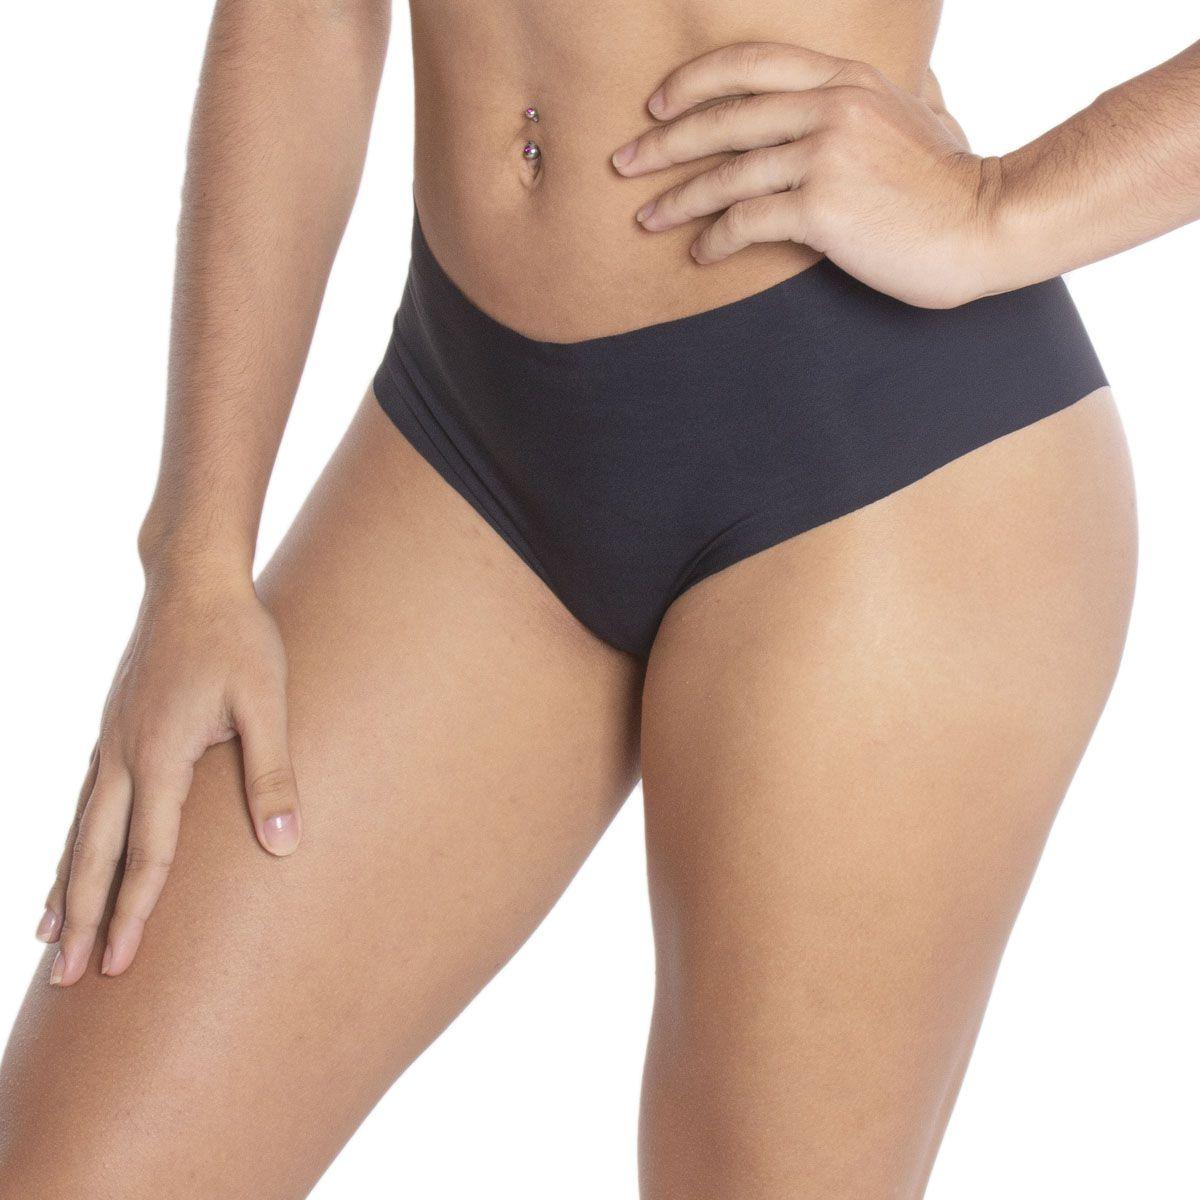 Calcinha moda intima lingerie tanga sem costura Nayane Rodrigues